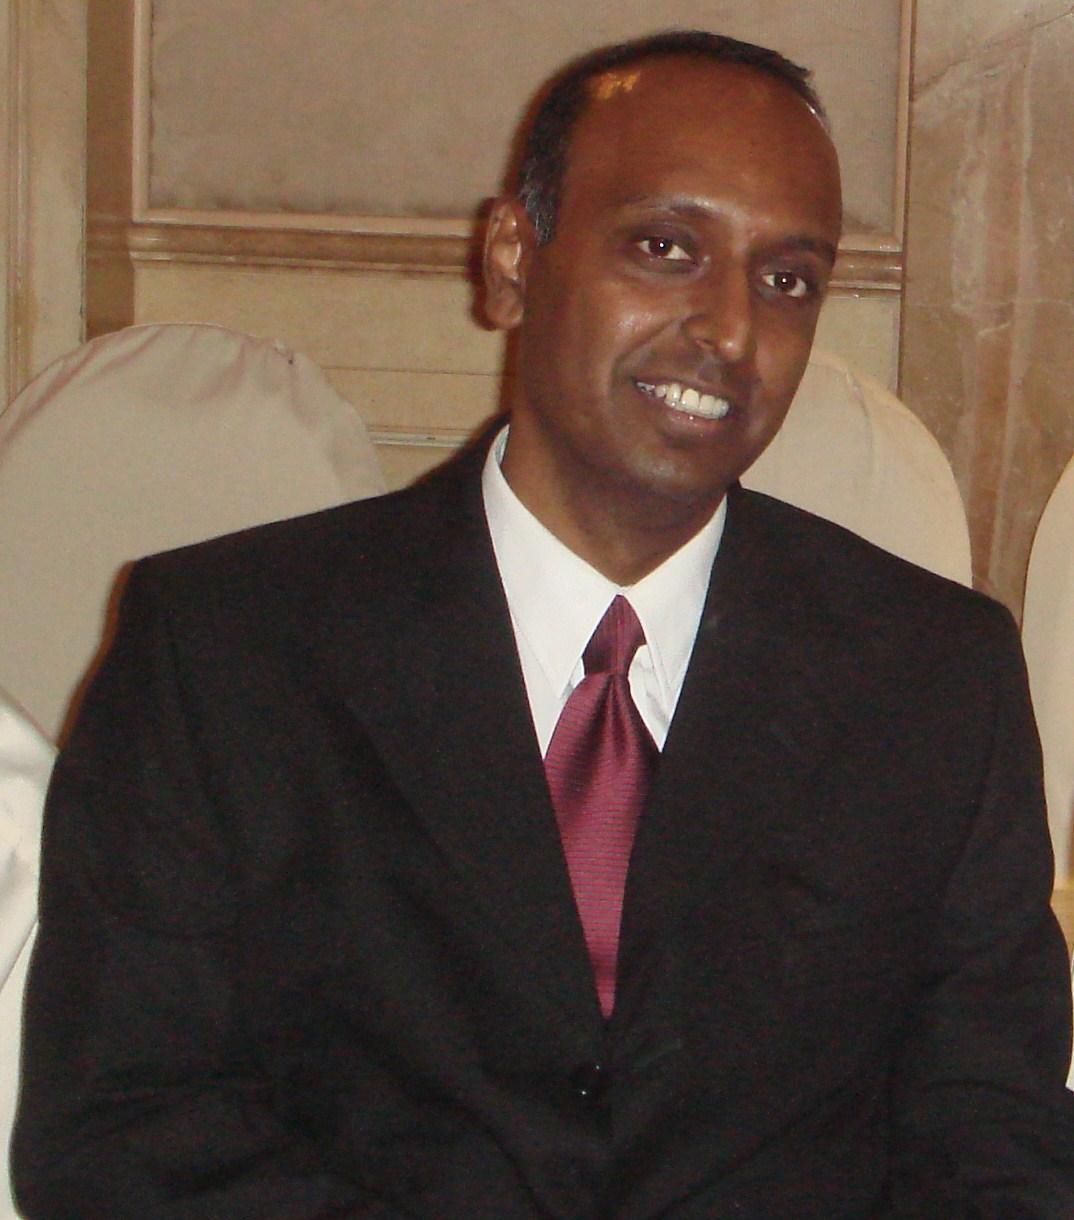 Govindarajan Narayanan